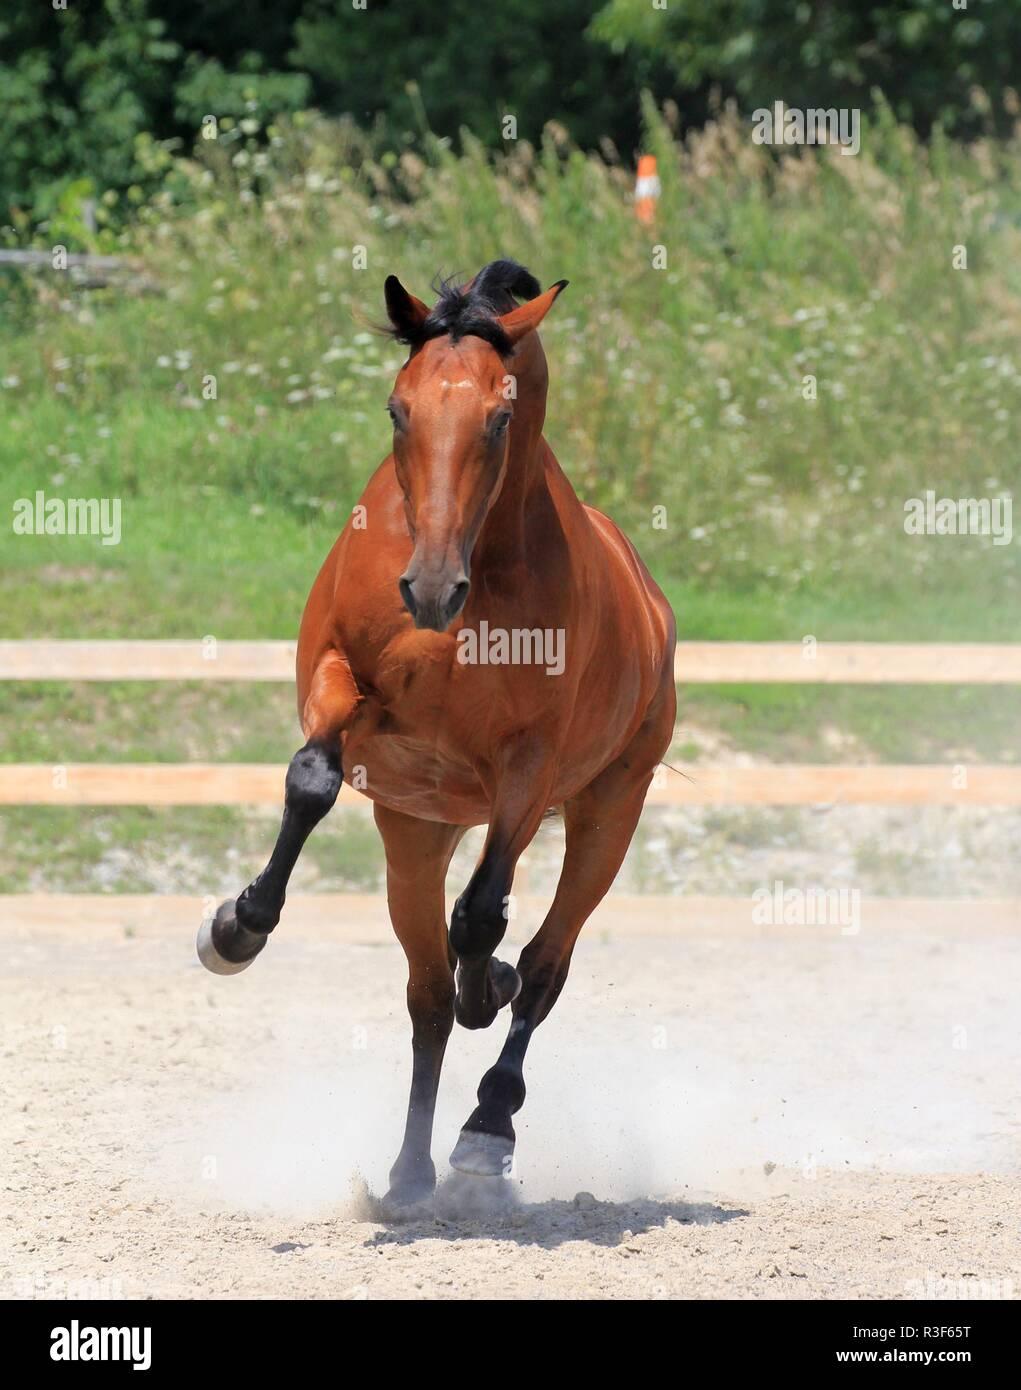 Galloping horse - Stock Image